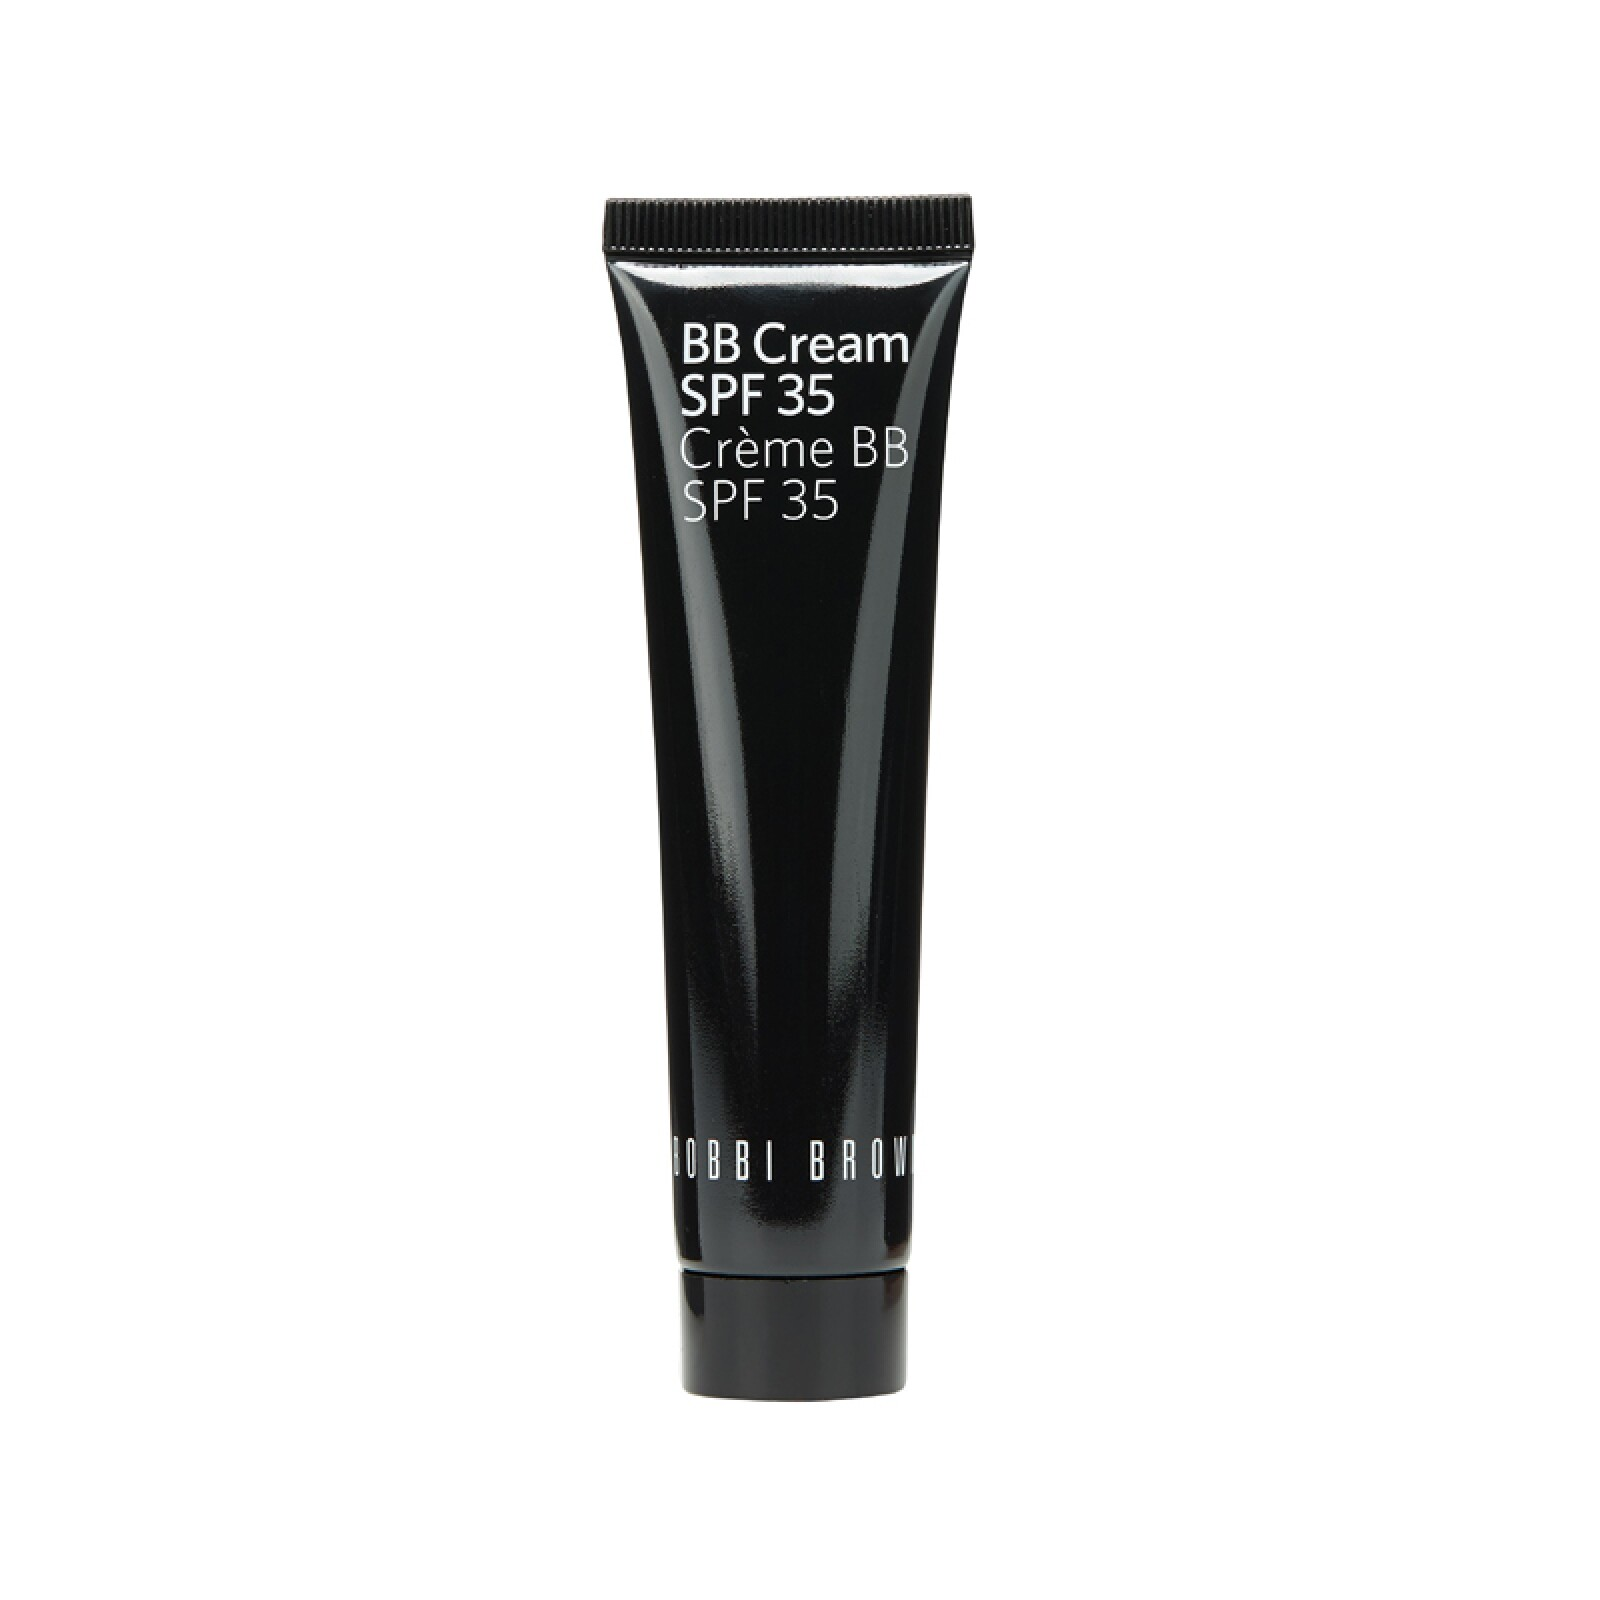 bb cream-bb creams-maquillaje-makeup-tratamiento-hidratante-beauty balm-bobbi brown